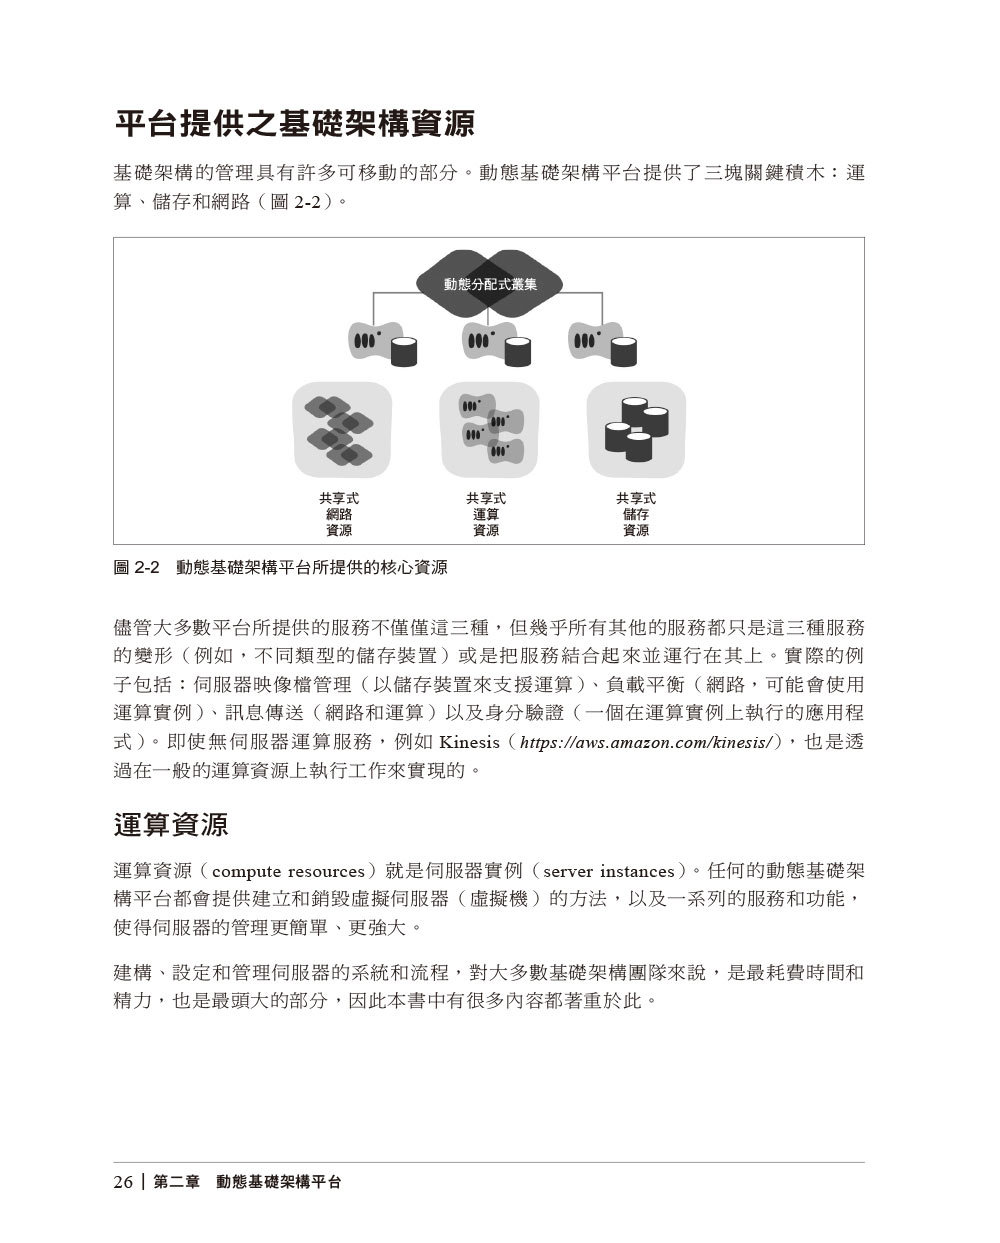 基礎架構即程式碼 管理雲端伺服器 (Infrastructure as Code: Managing Servers in the Cloud)-preview-6